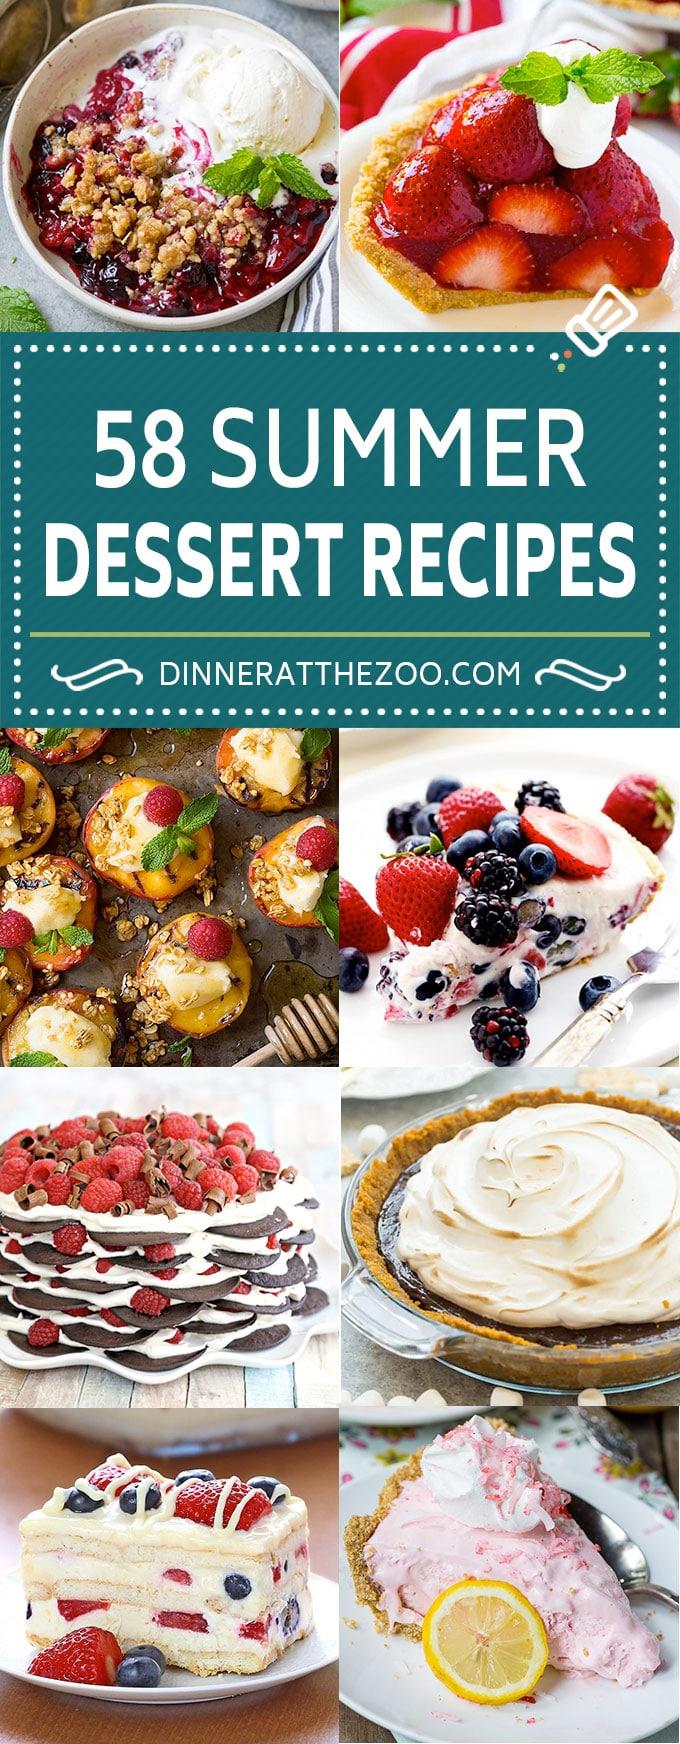 58 Summer Dessert Recipes | Frozen Dessert Recipes | No Bake Dessert Recipes | Fruit Crisps #summer #dessert #recipes #sweets #dinneratthezoo